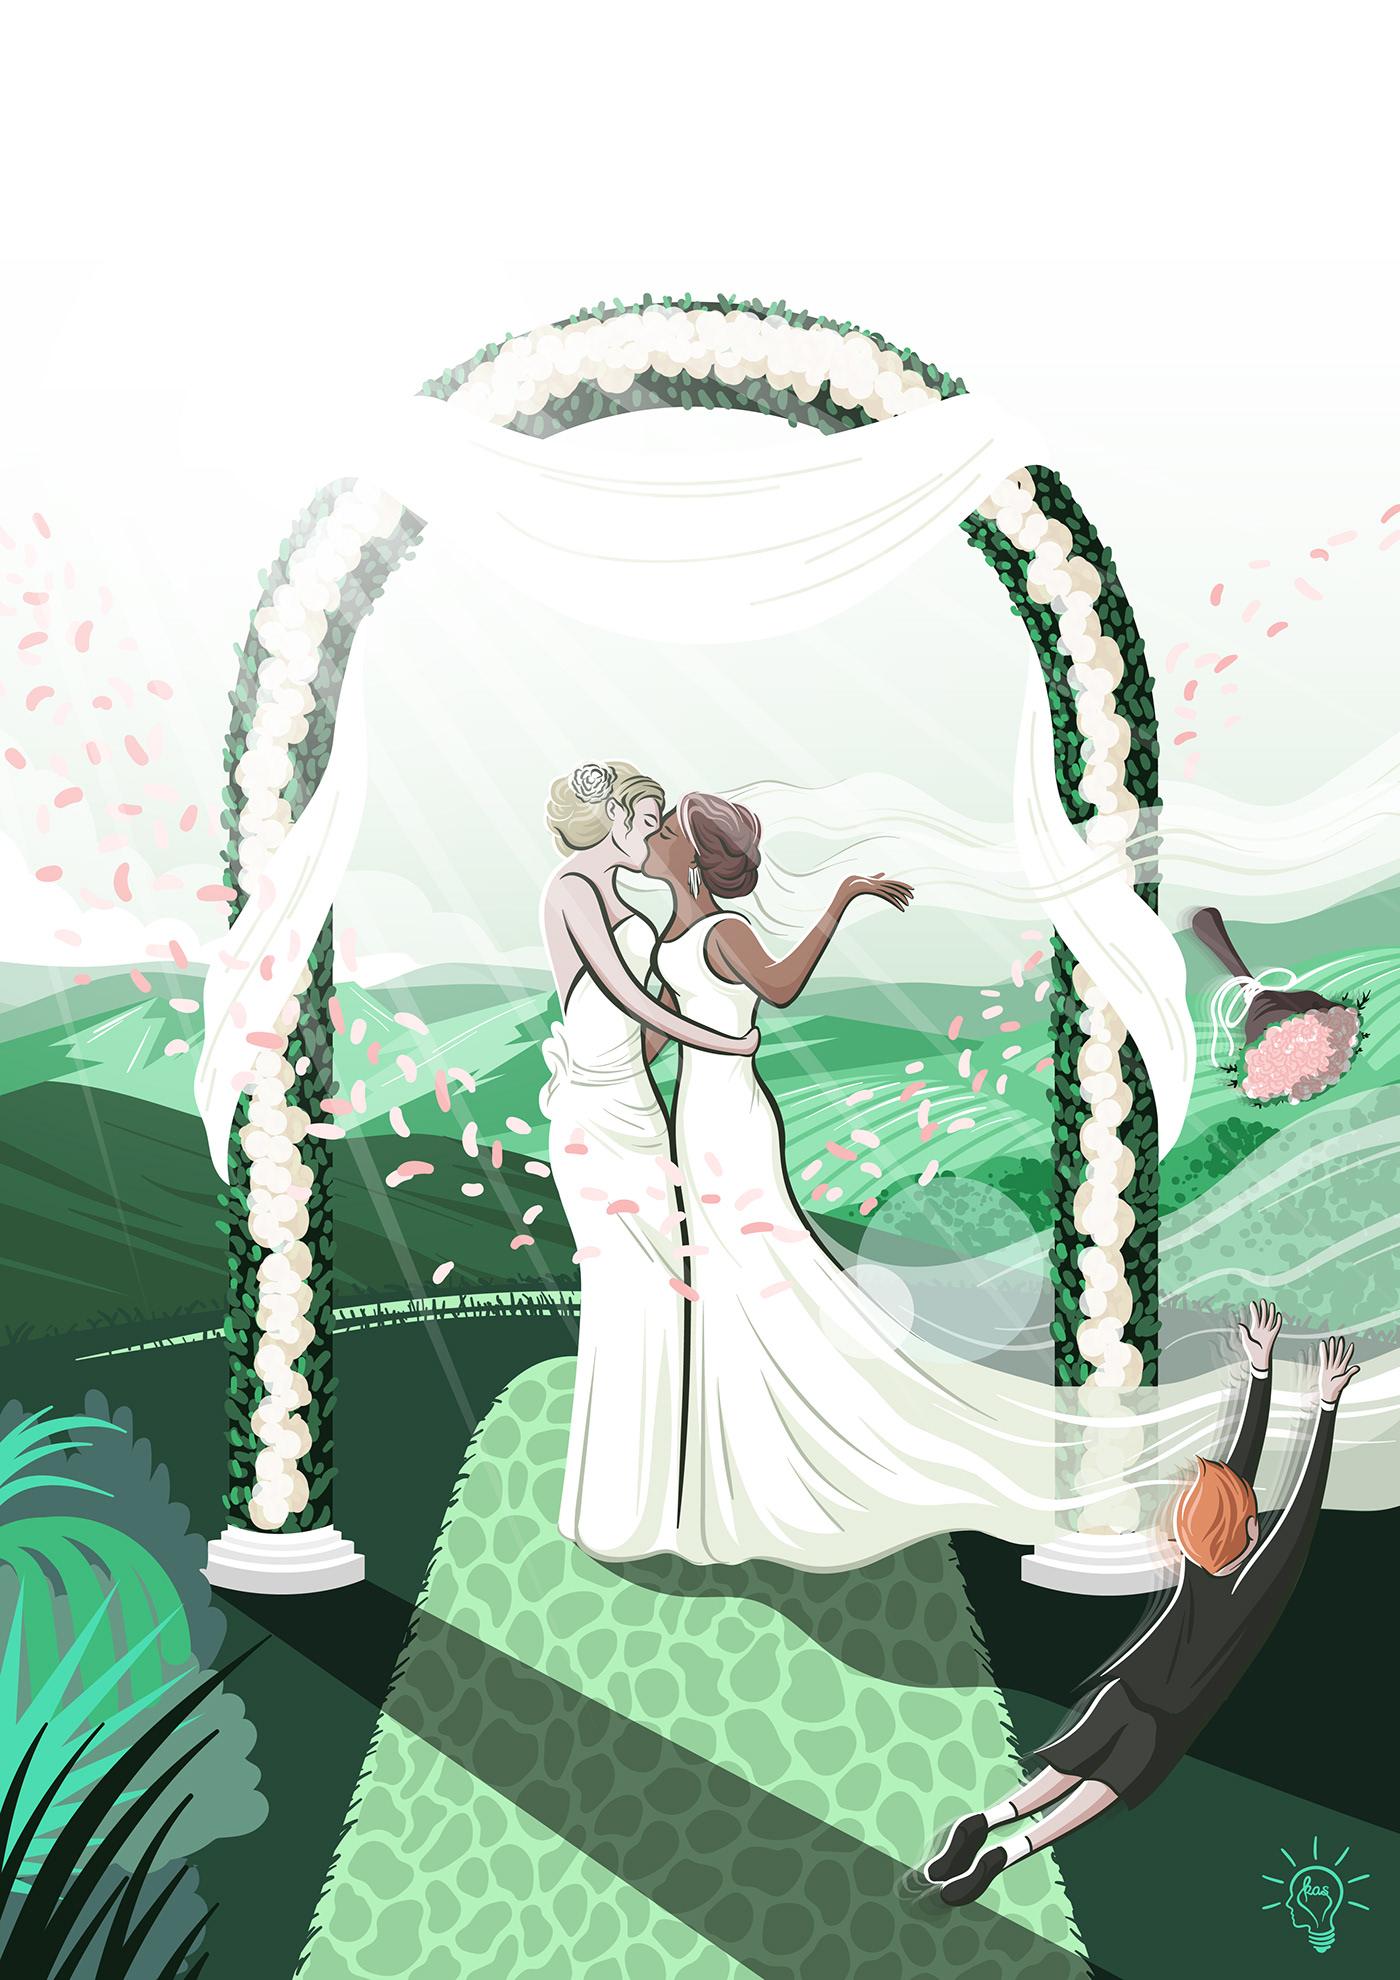 Image may contain: dance, wedding dress and cartoon